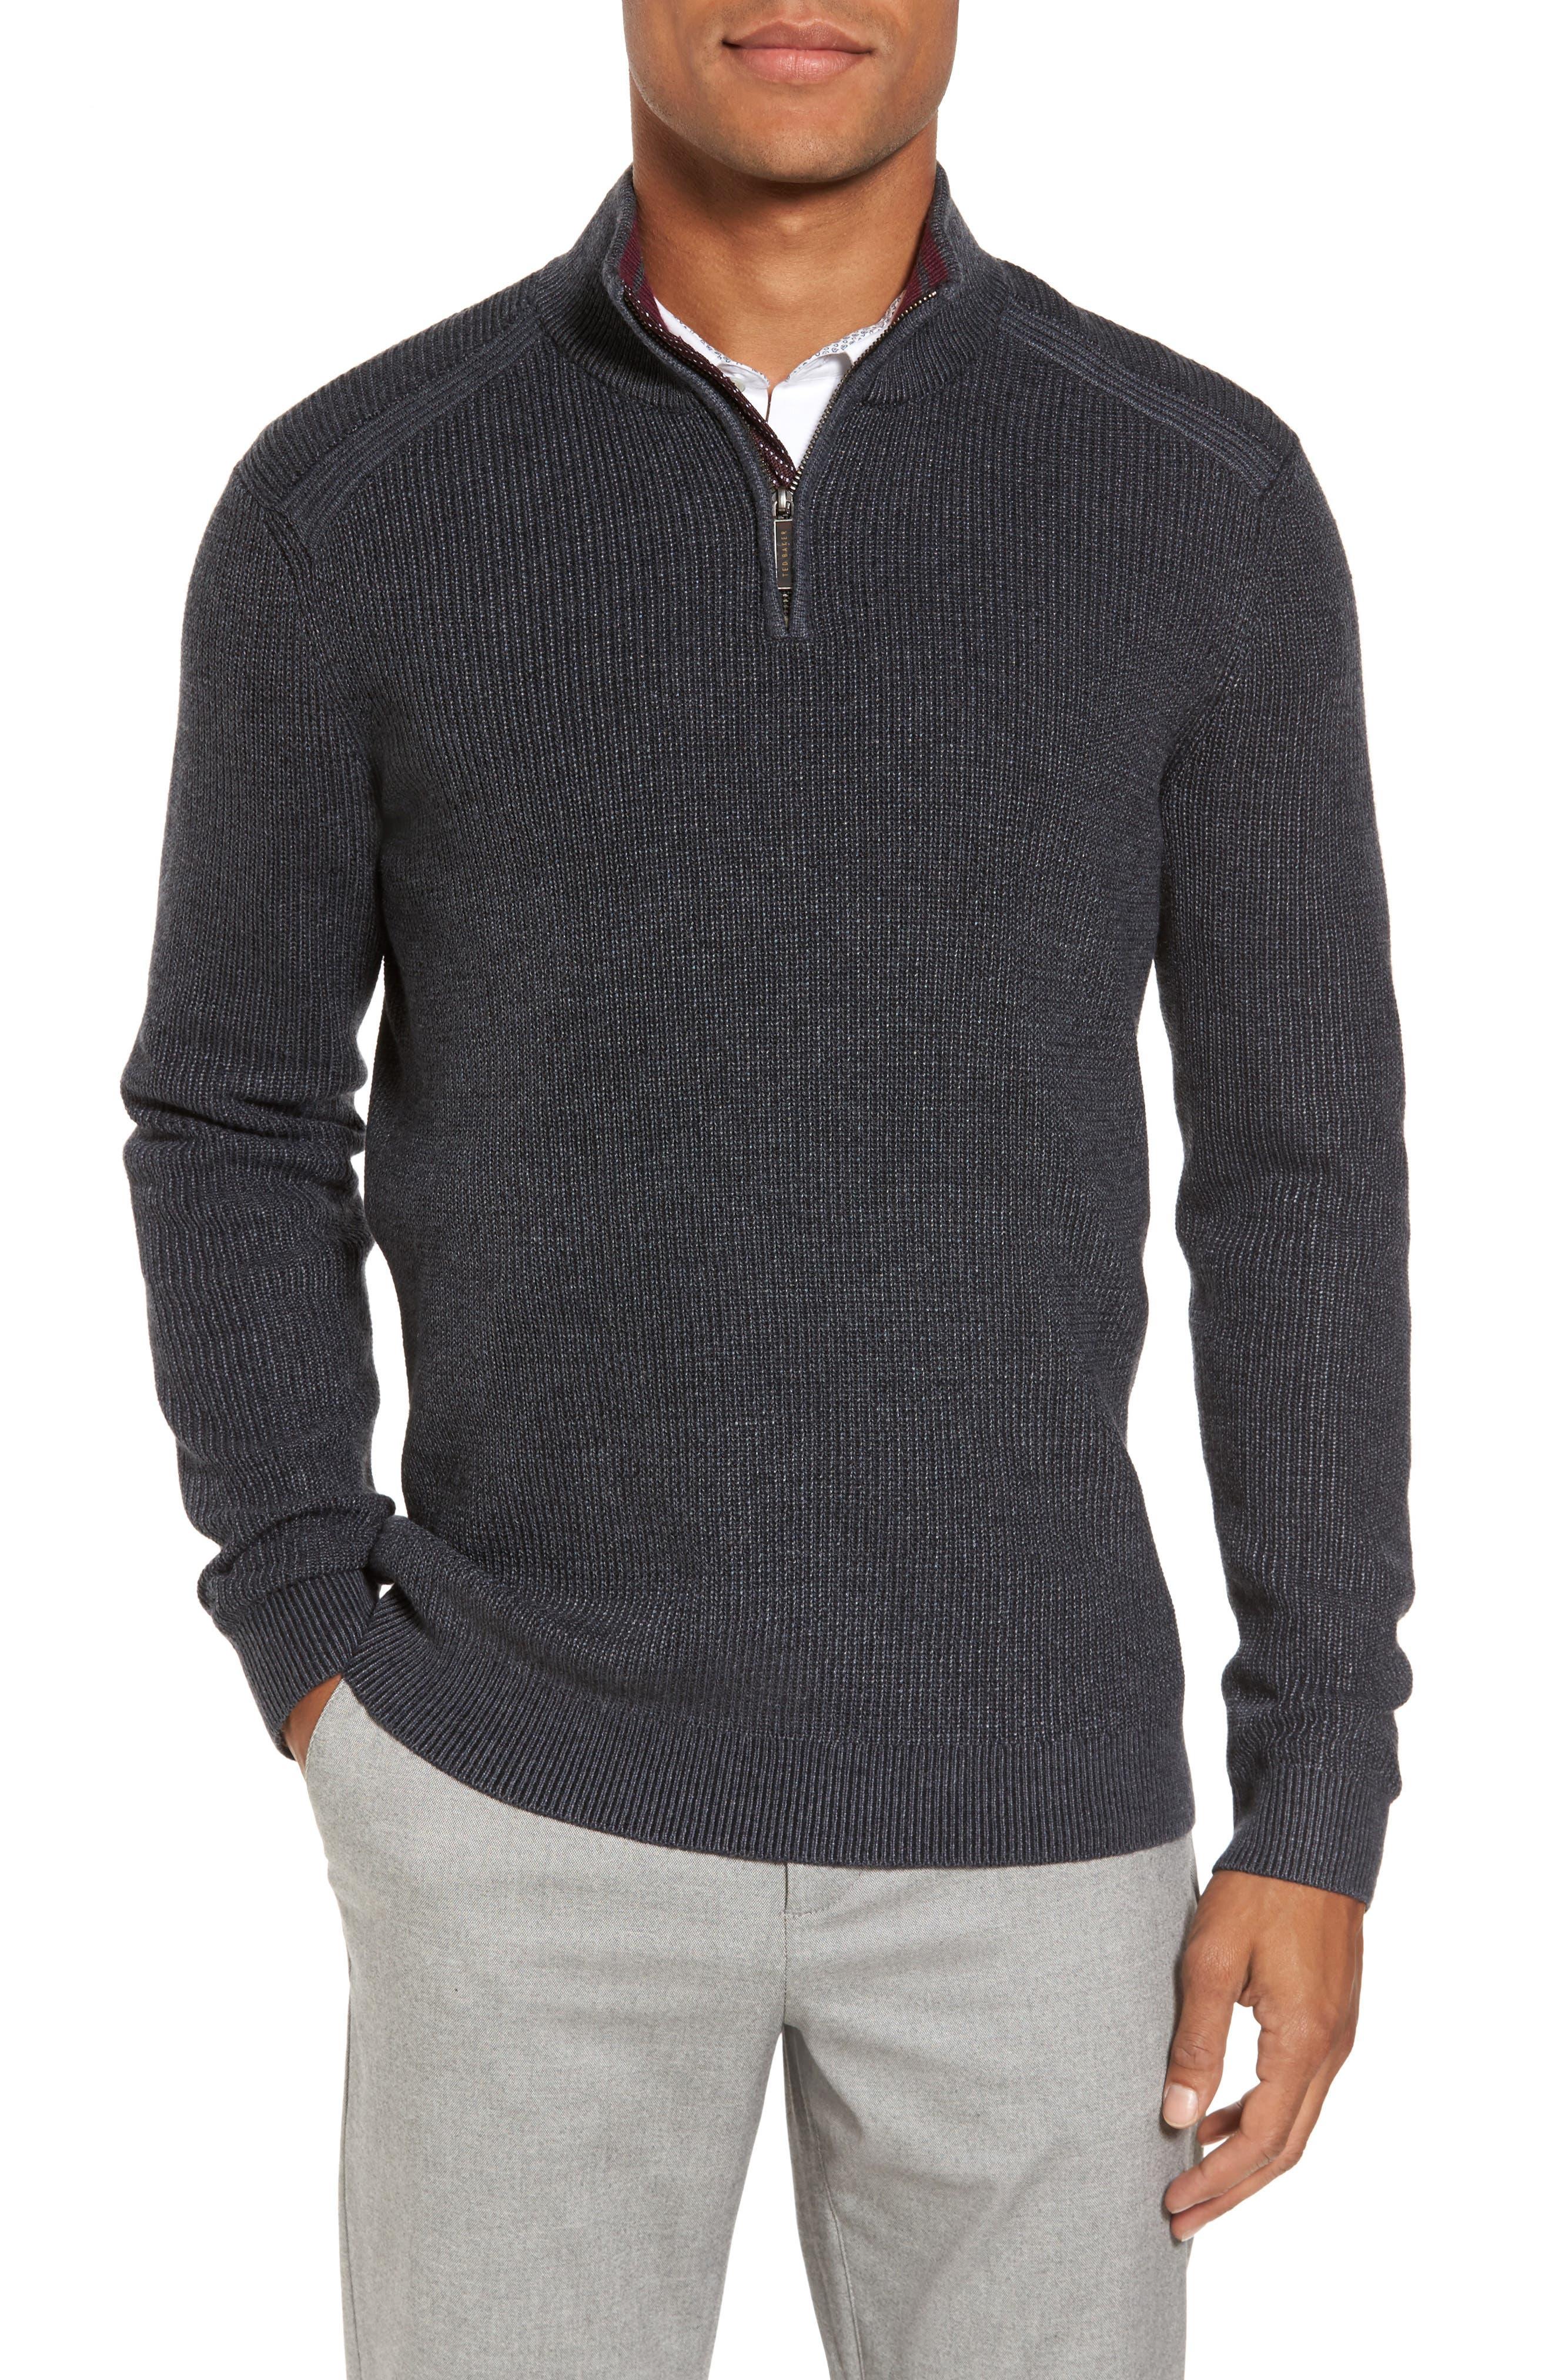 Stach Quarter Zip Sweater,                         Main,                         color, 010